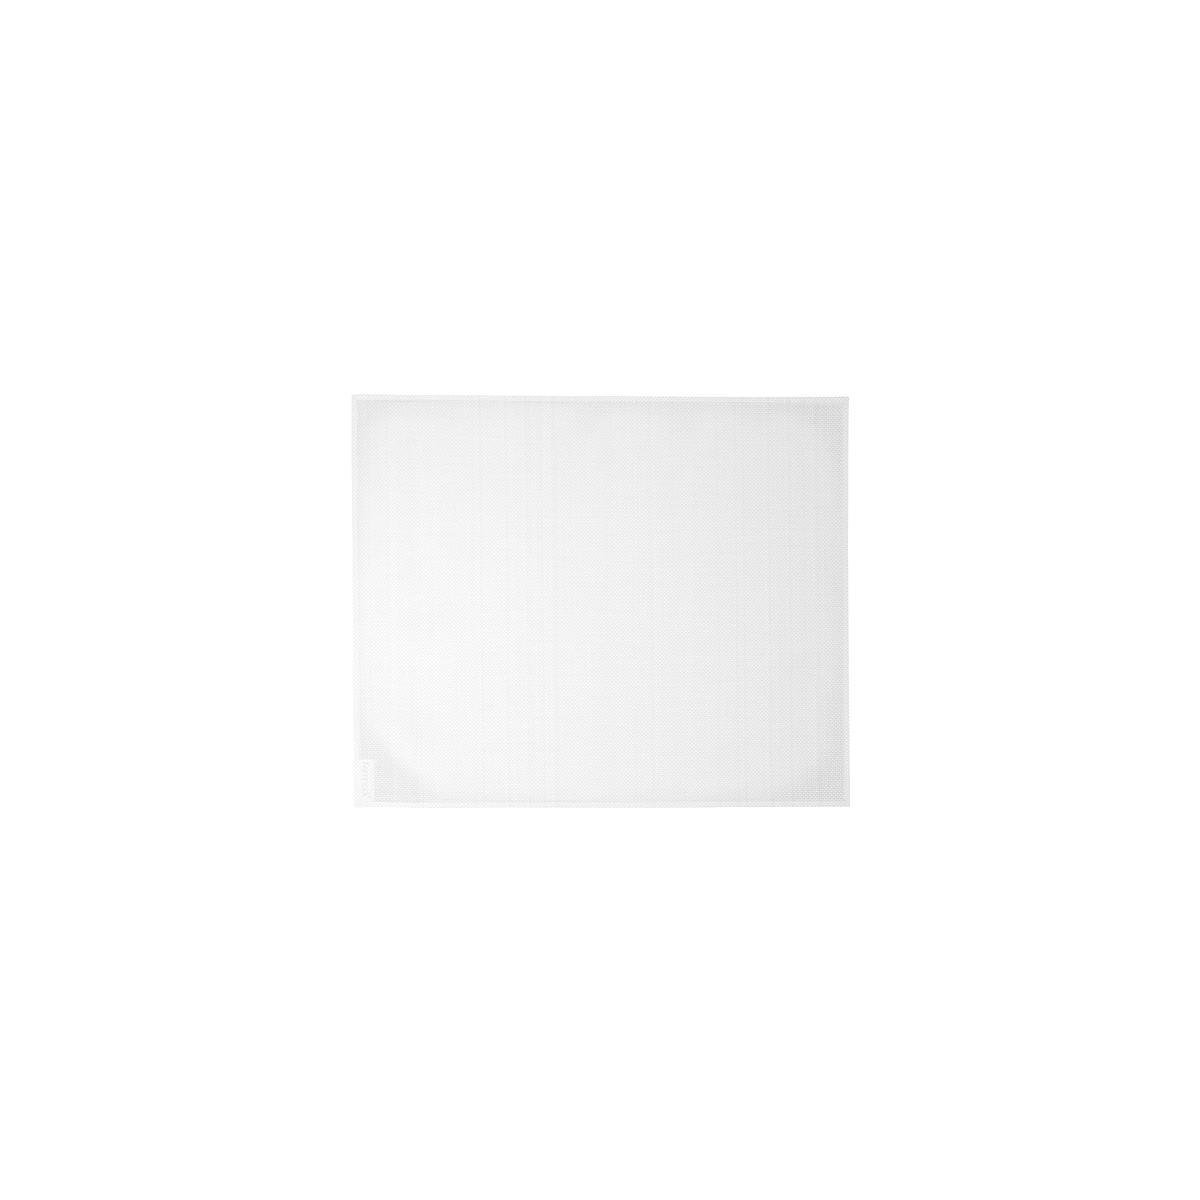 Set de Table LES BASICS Fermob blanc coton